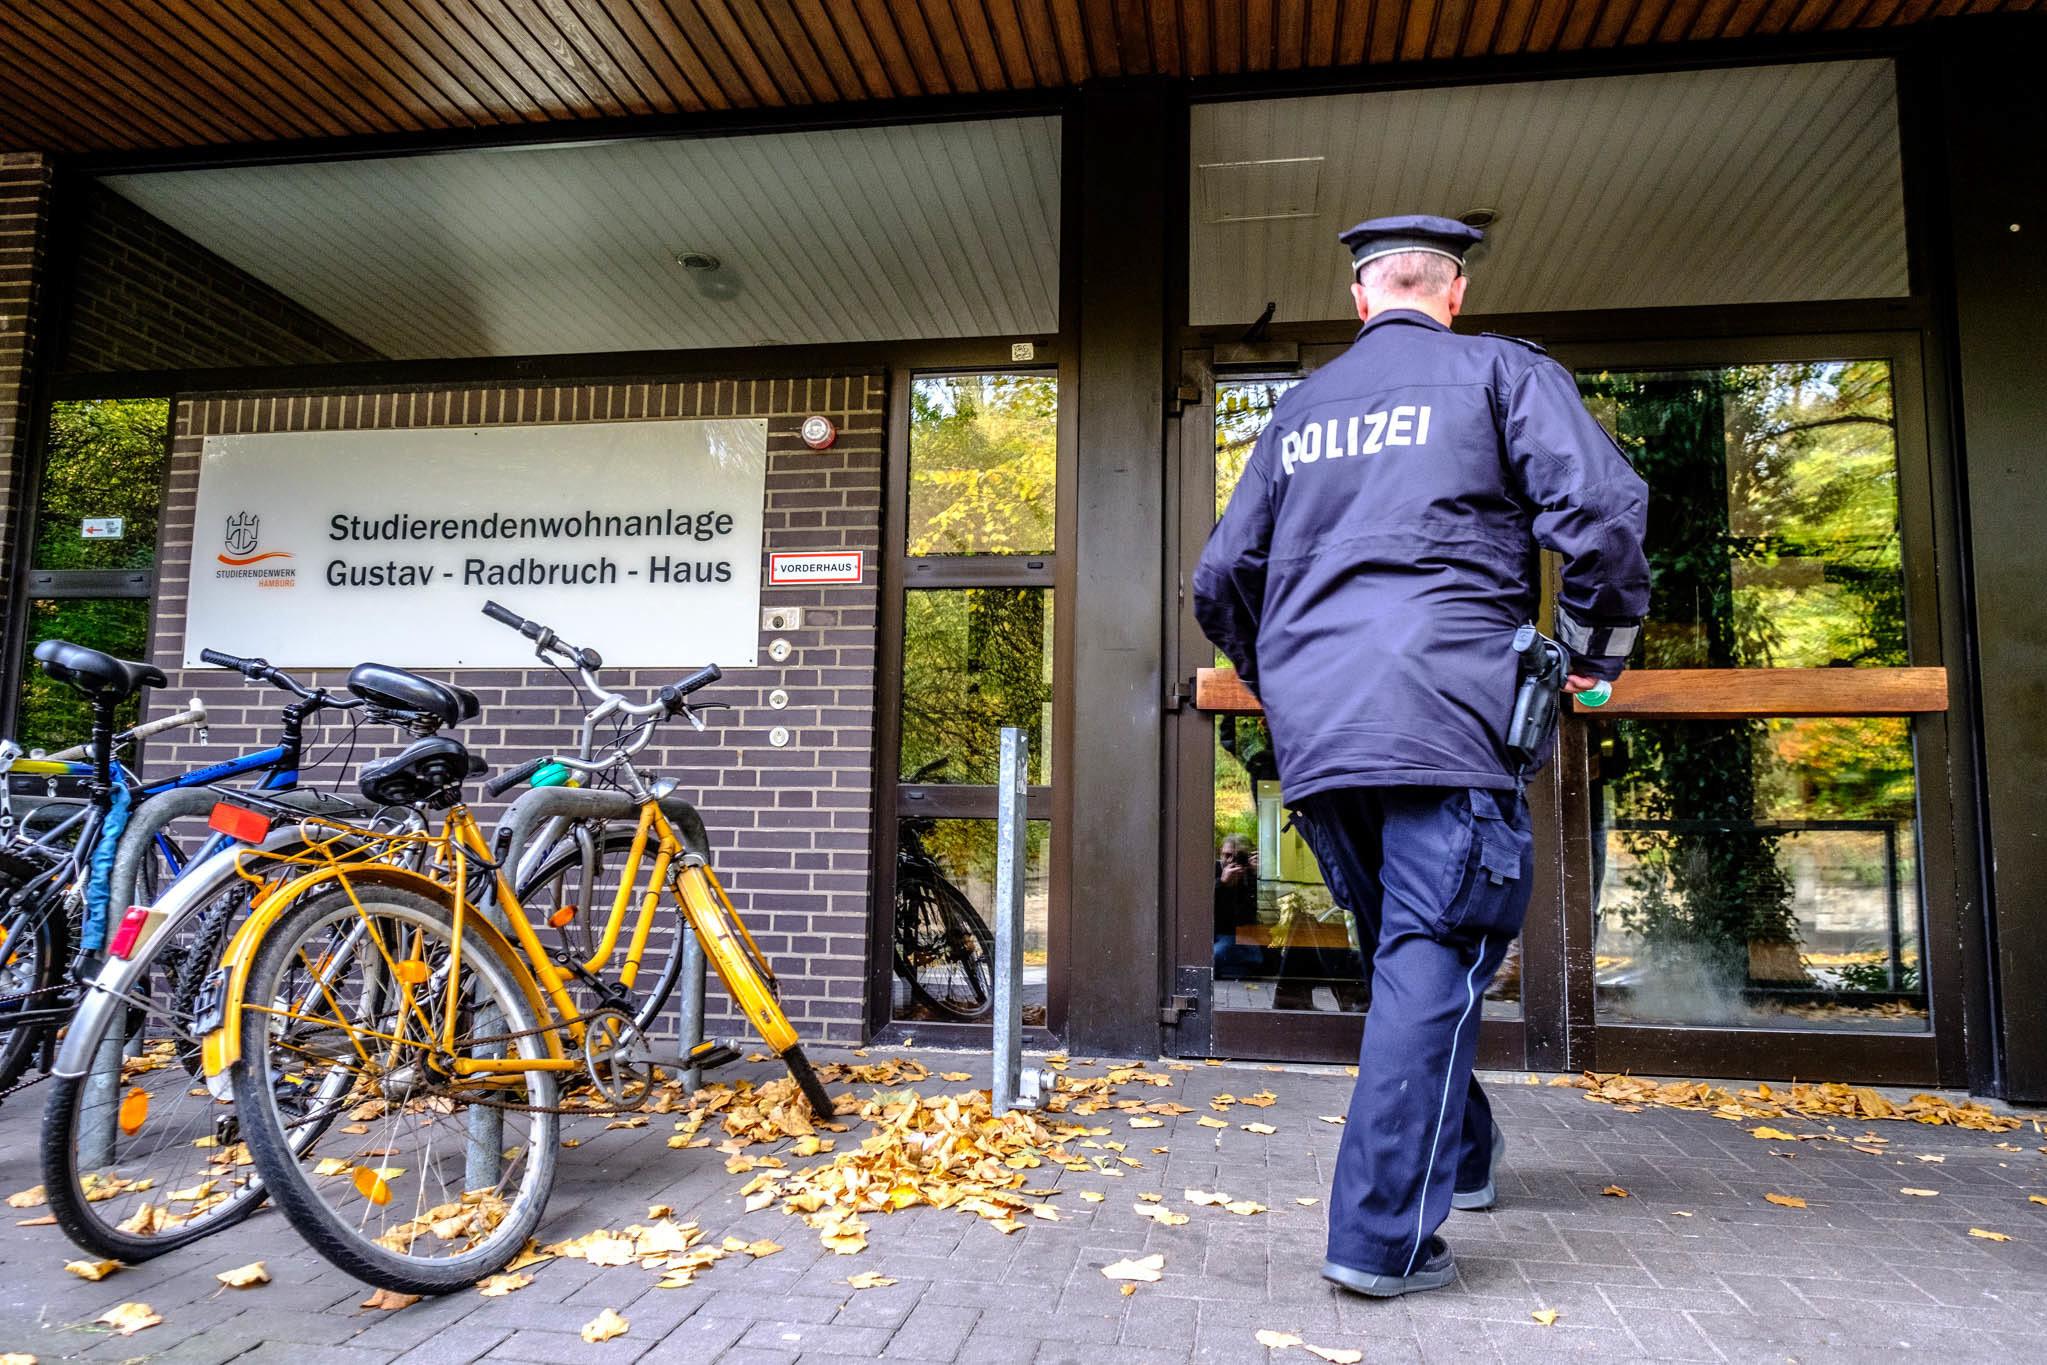 Michael Arning - 2018-10-19 Student ersticht Freundin nach Streit